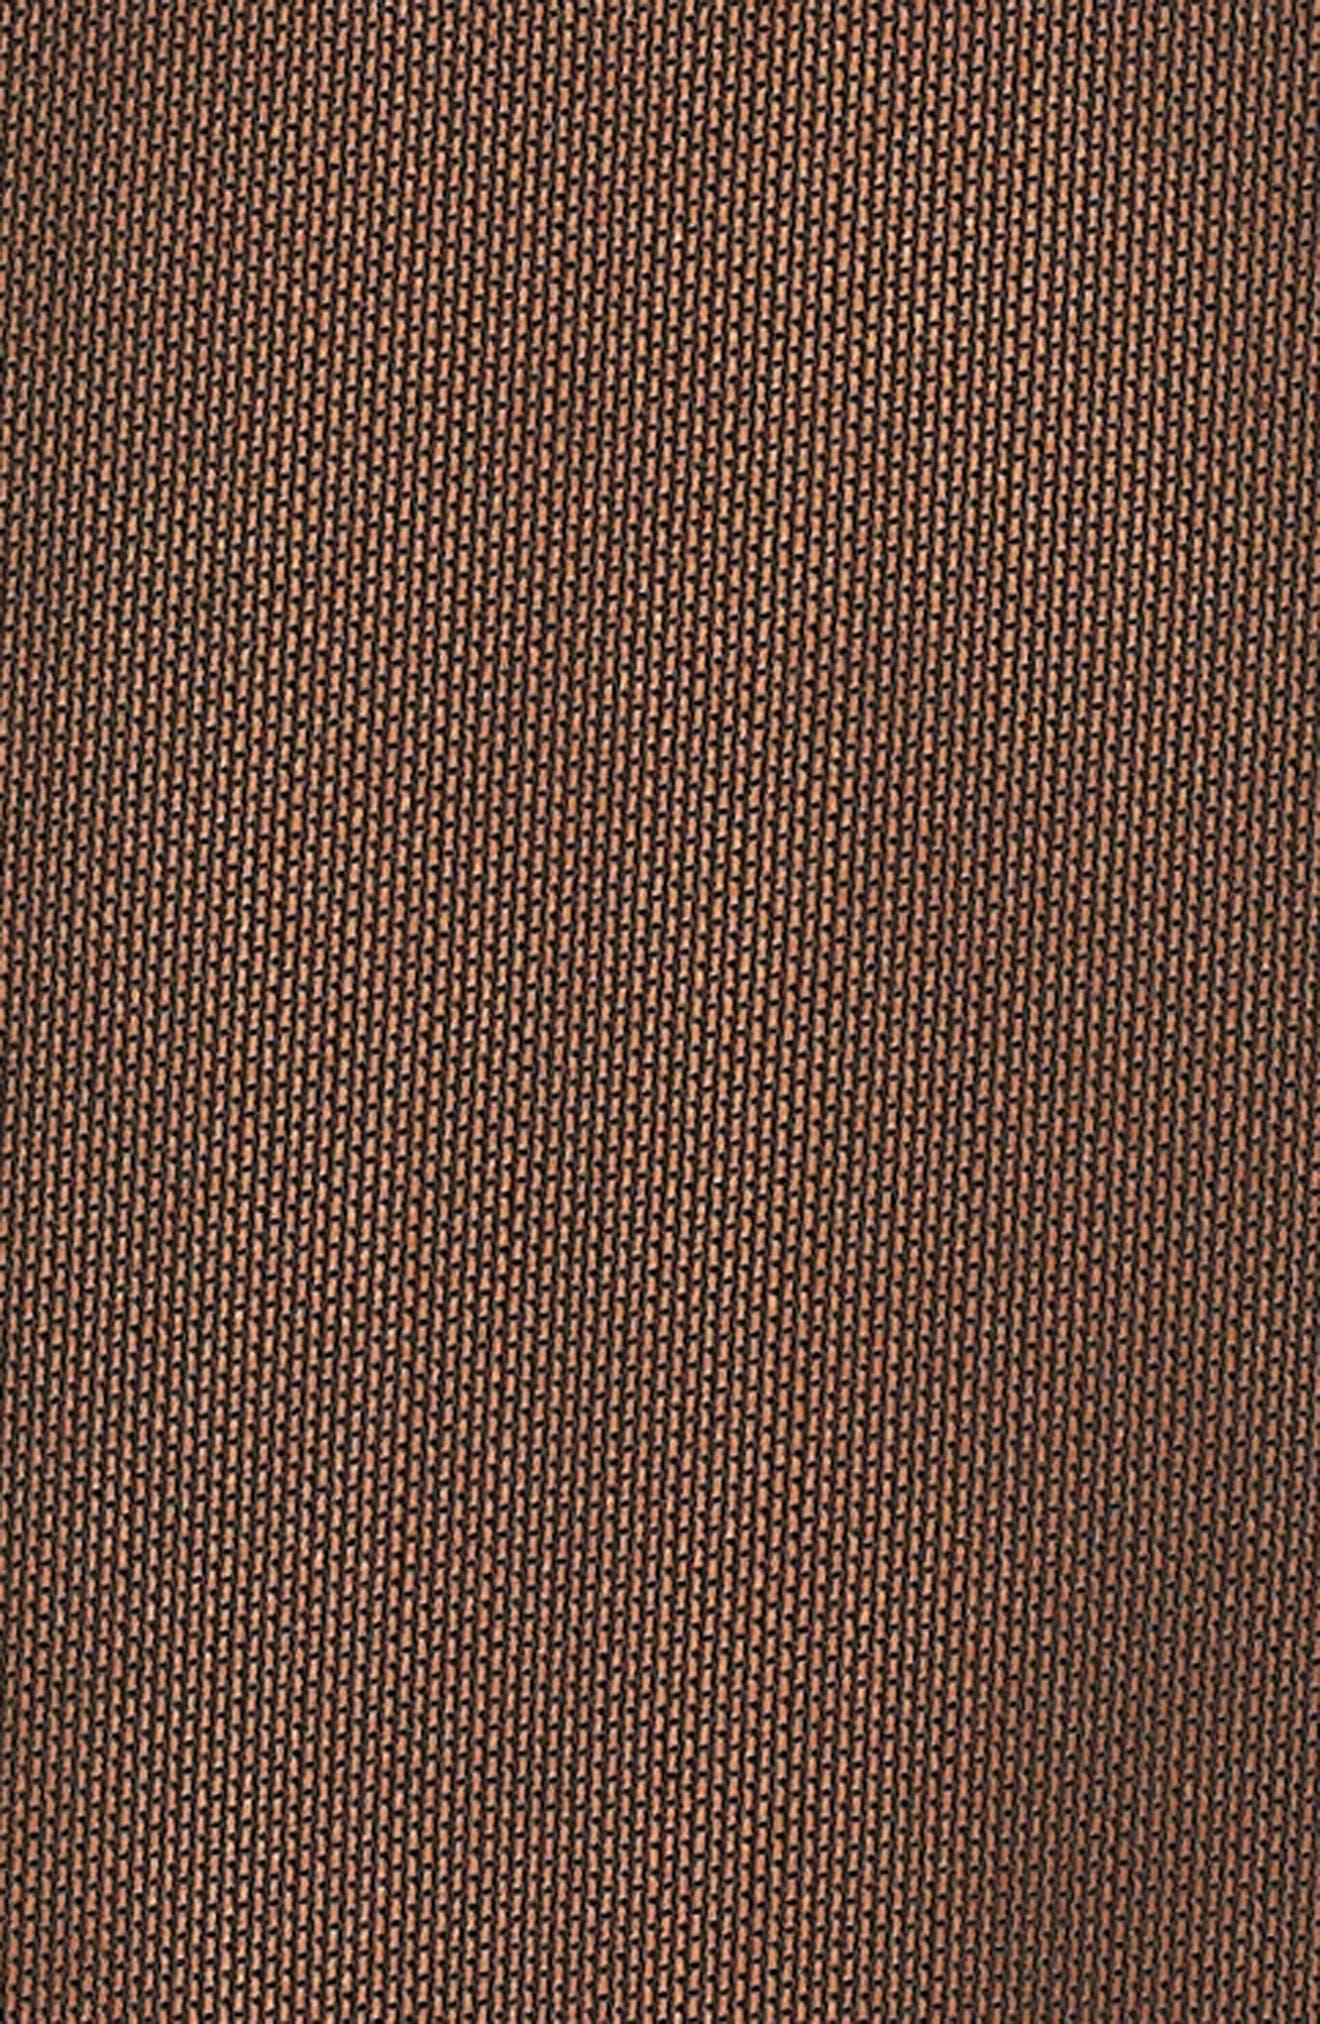 Sheer Tie Front Crop Top,                             Alternate thumbnail 5, color,                             Black